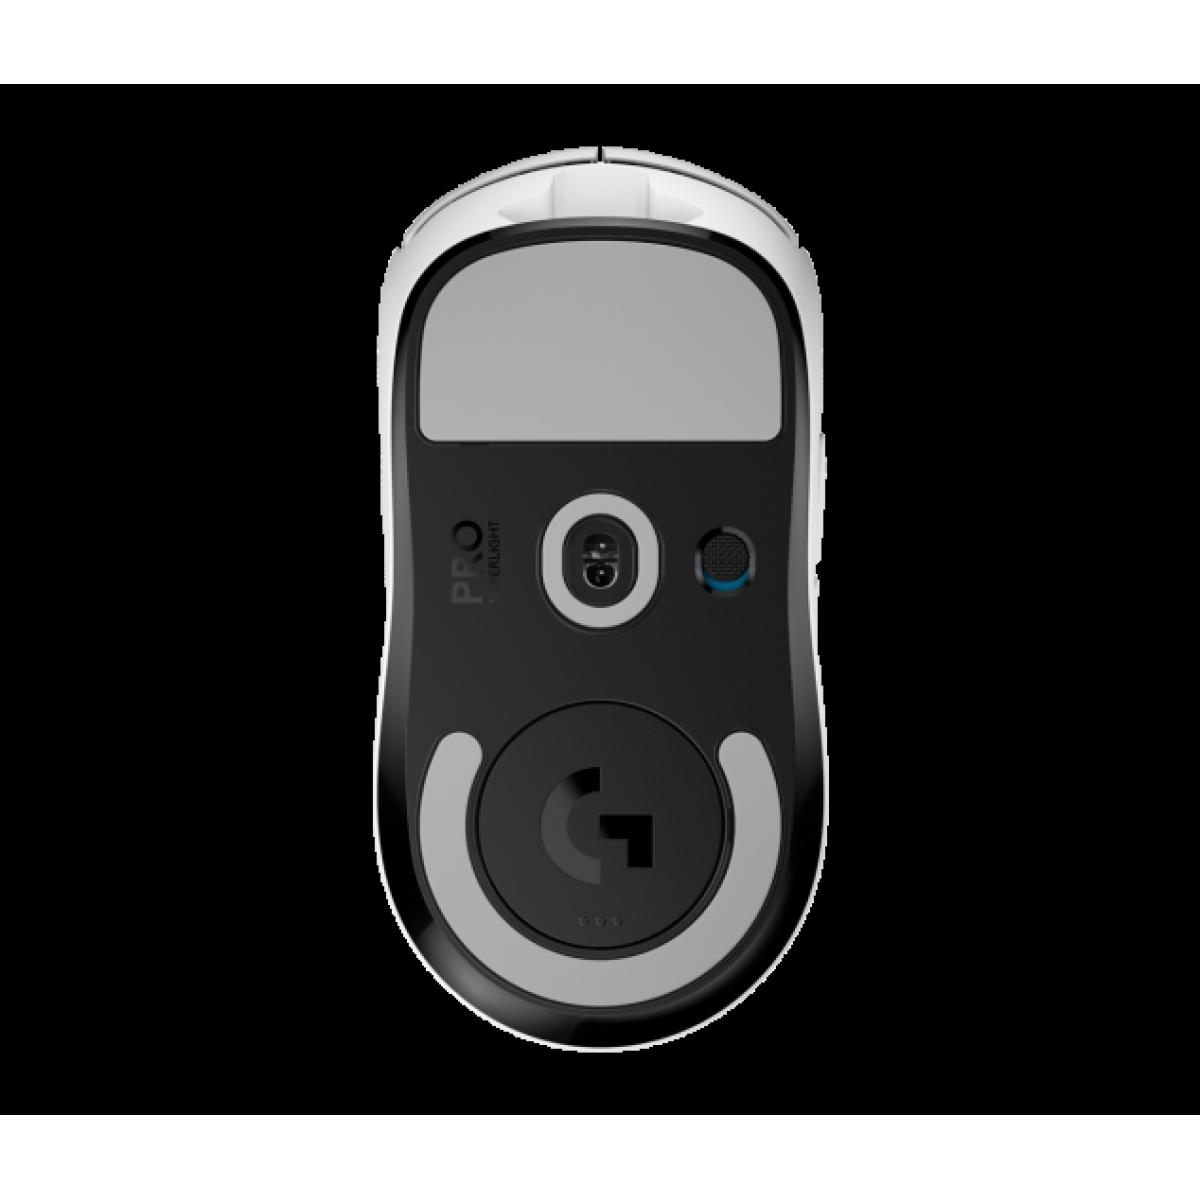 Mouse Gamer Wireless Logitech G Pro X Superlight, 25.400 DPI, 6 Botões, White, 910-005941